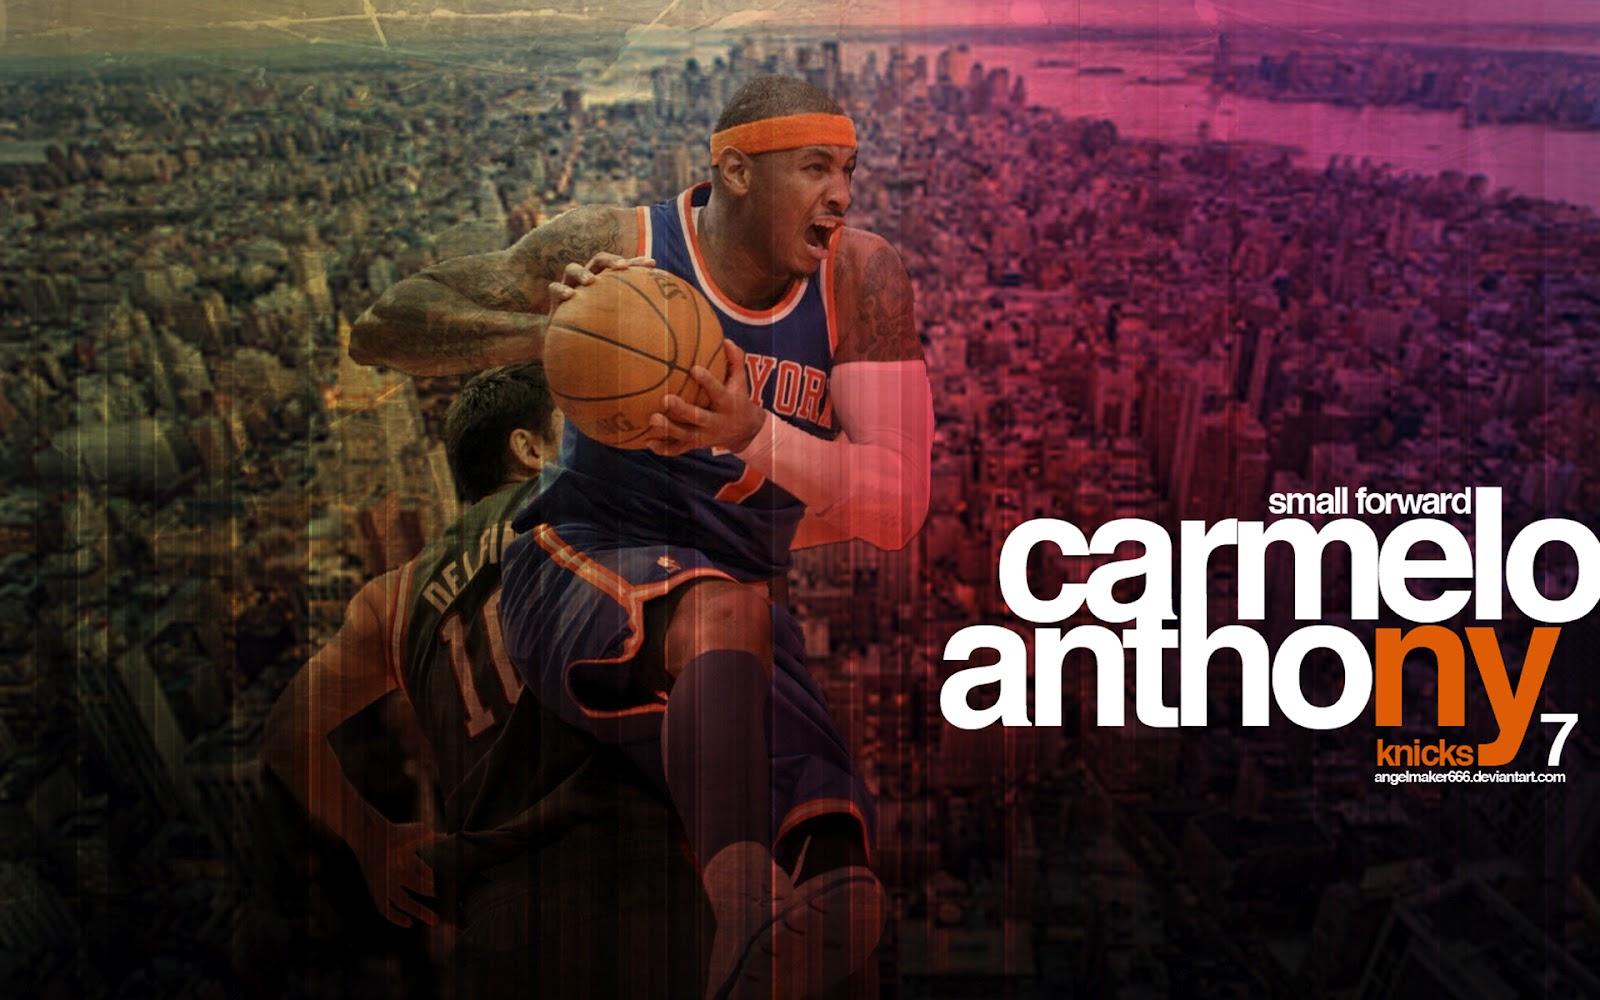 http://4.bp.blogspot.com/-j0Eoy03Pasc/T_n5PfgyfwI/AAAAAAAAMOY/xUvcGeHaRTw/s1600/carmelo_anthony_basketball_hd_wallpaper.jpg